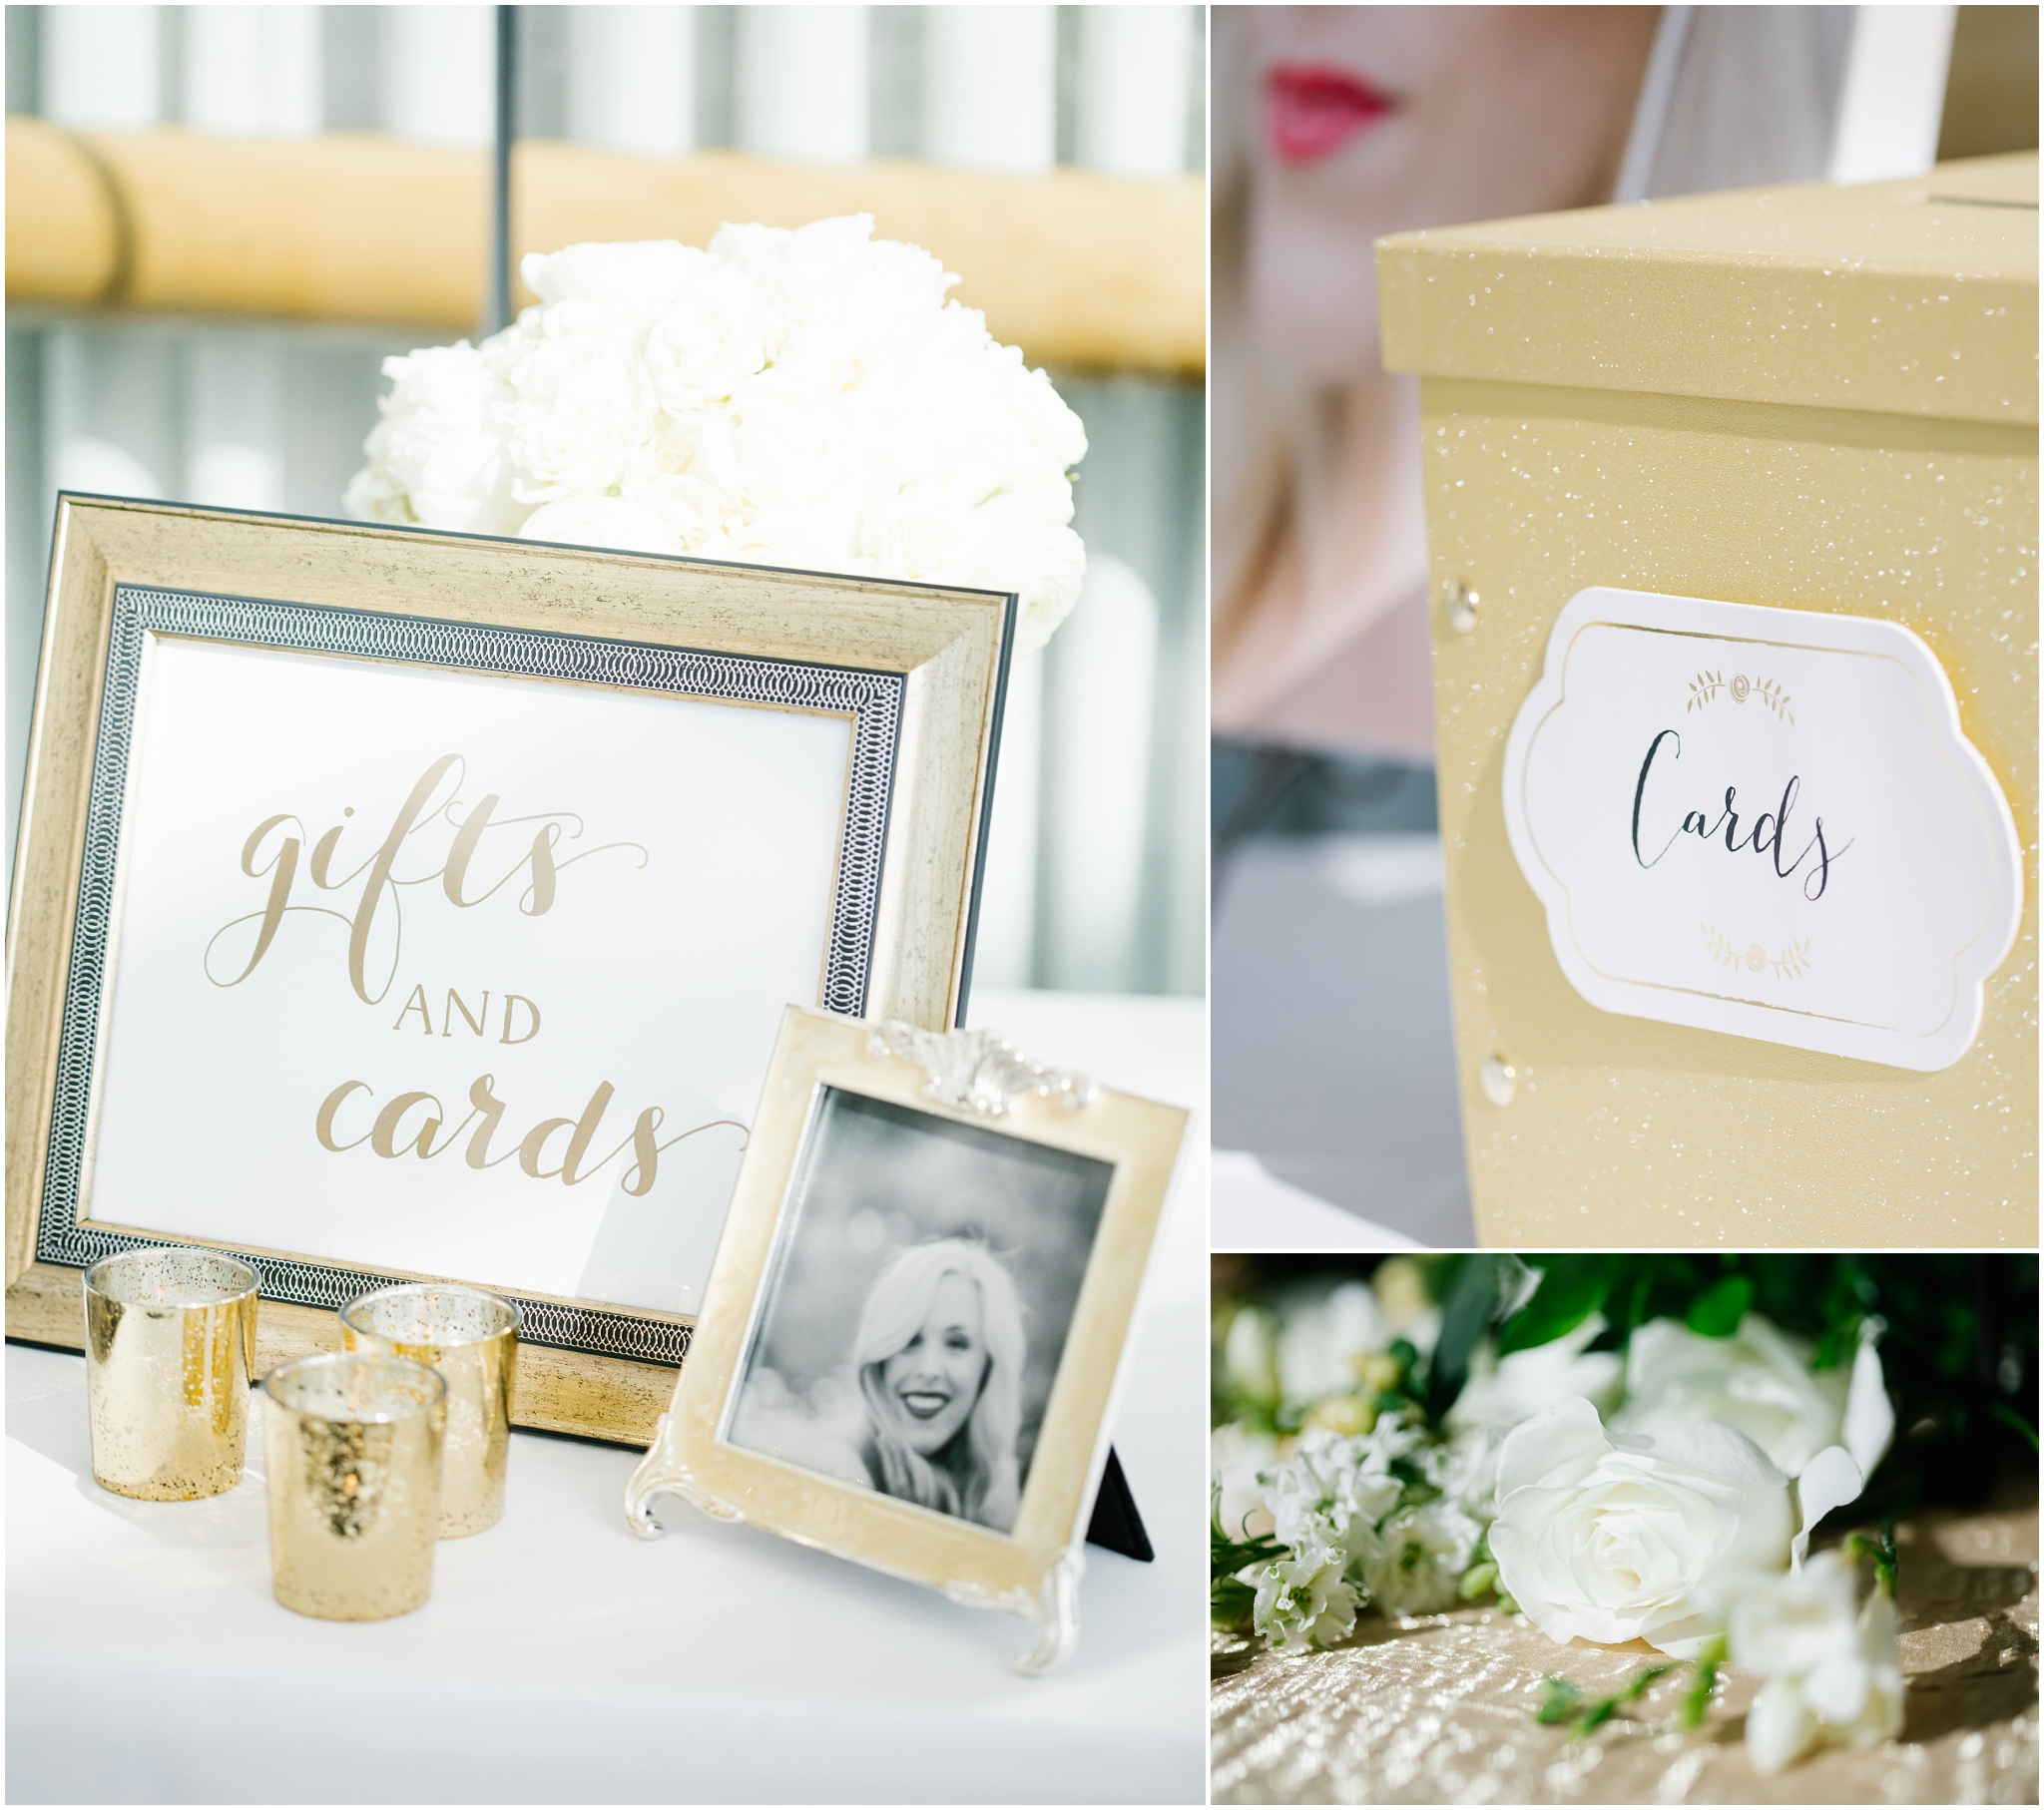 CherylandTyler-329_Lizzie-B-Imagery-Utah-Wedding-Photographer-Salt-Lake-City-Temple-Wells-Fargo-Building-Reception.jpg